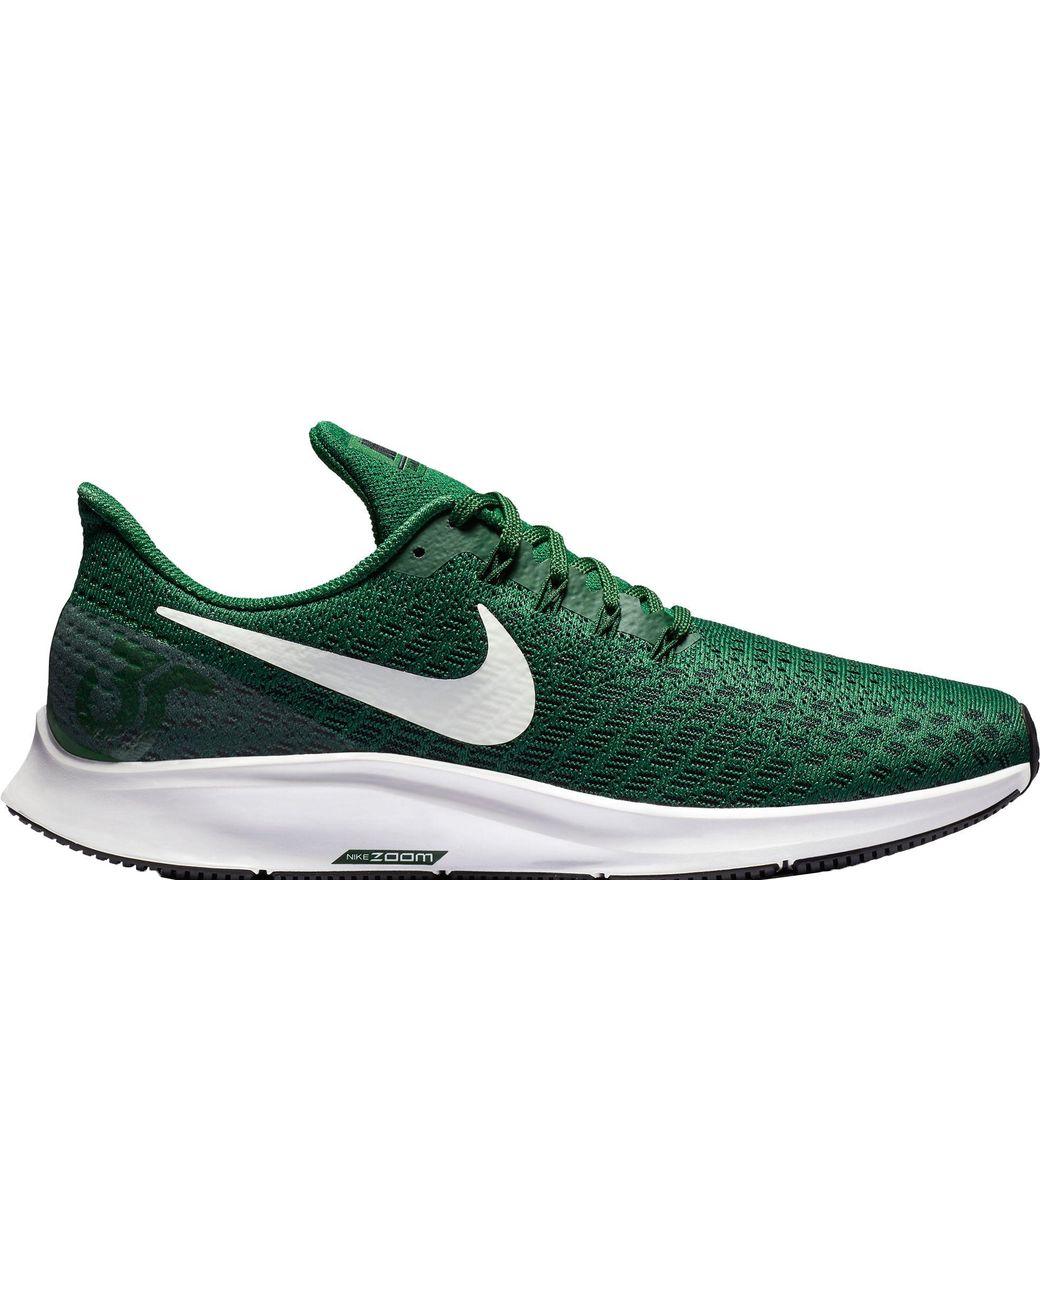 d5e8c07447b6 Lyst - Nike Air Zoom Pegasus 35 Running Shoes in Green for Men